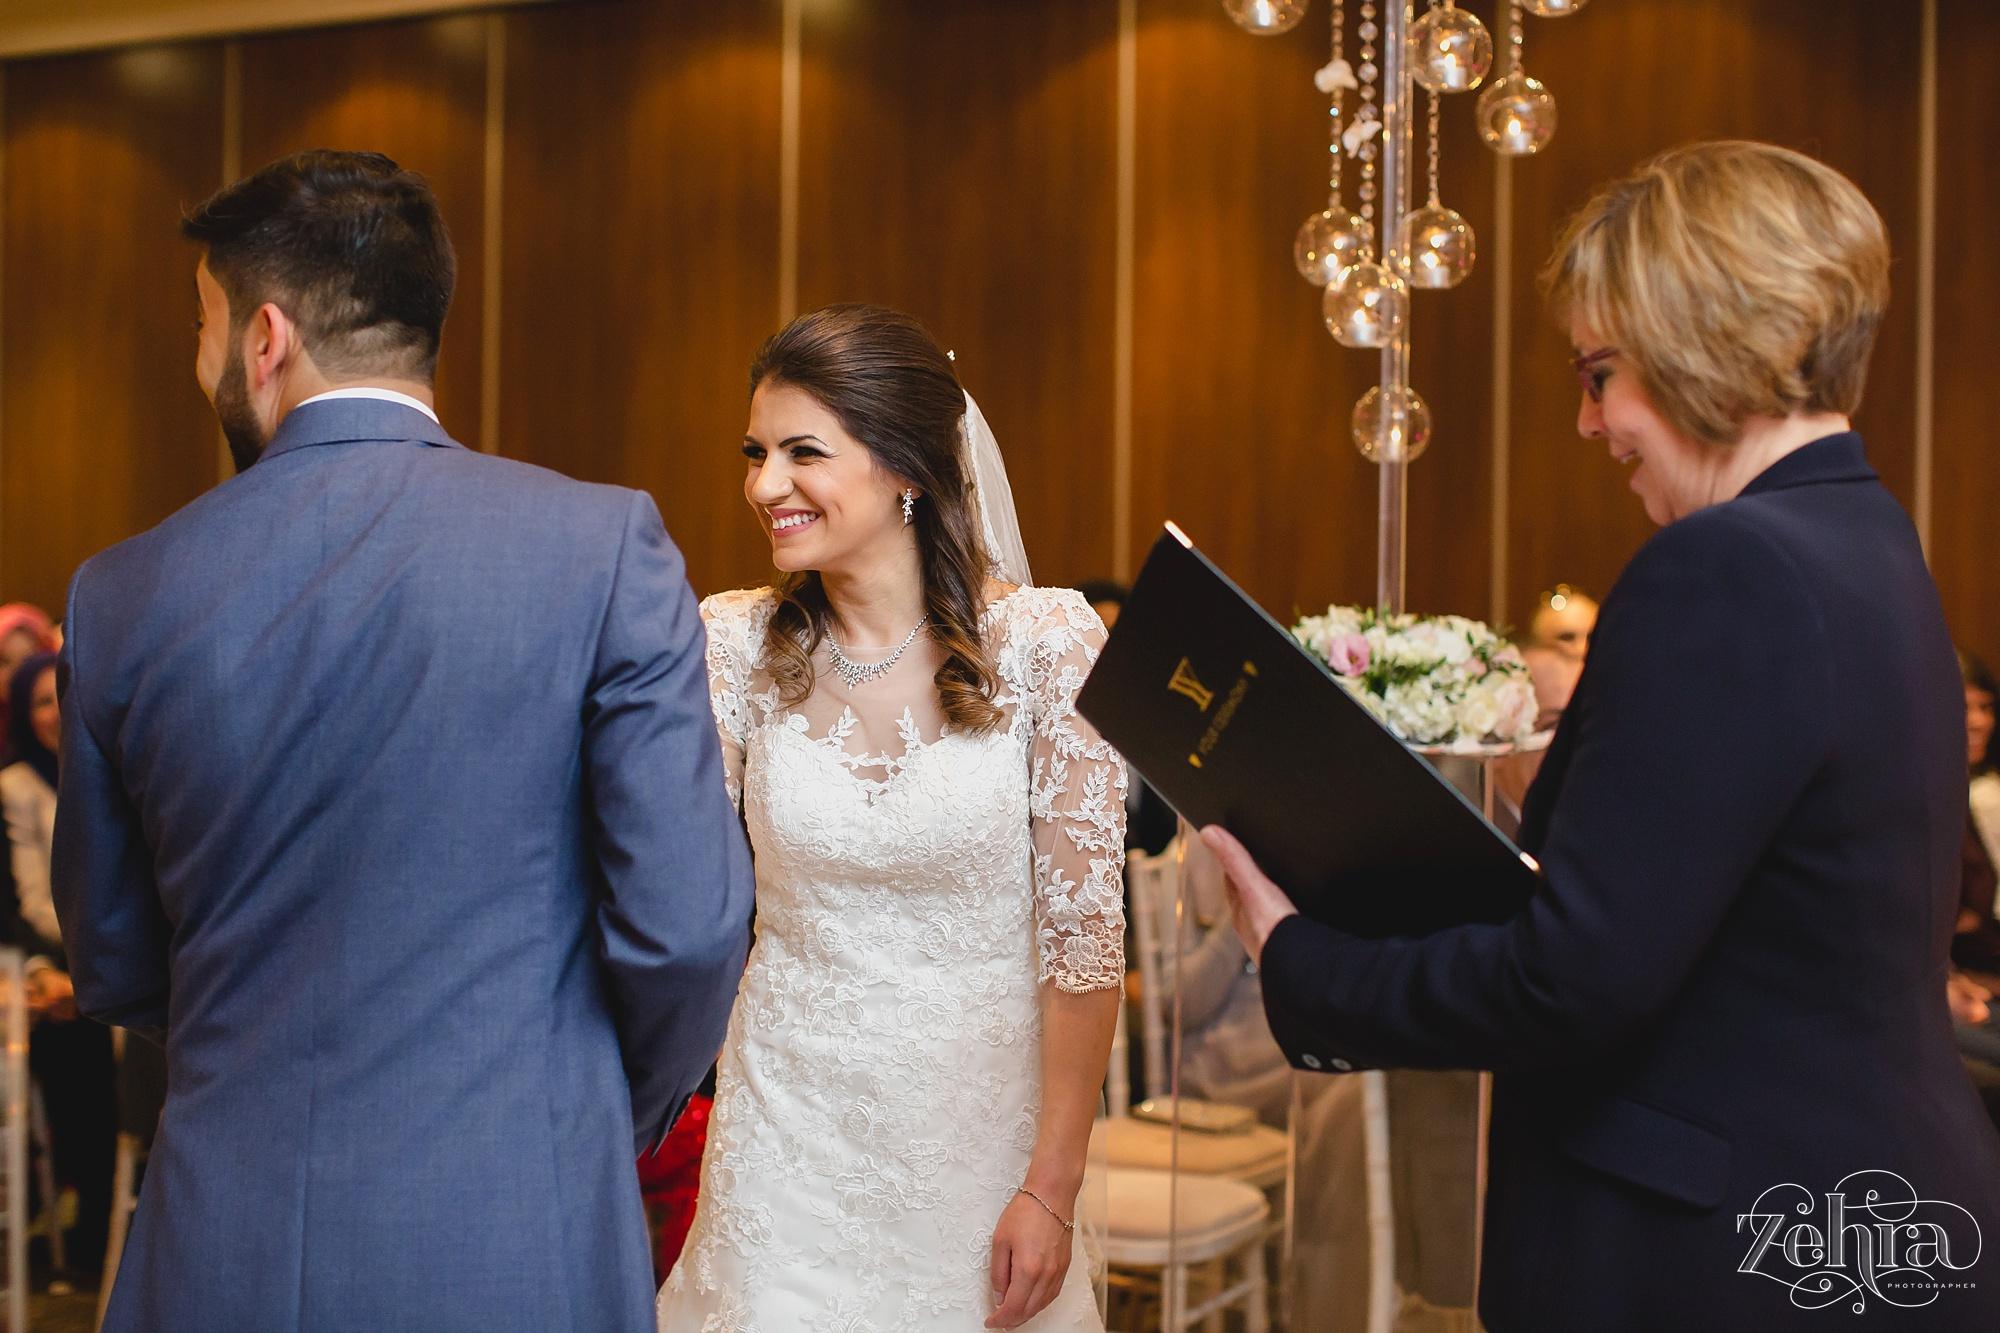 zehra photographer mere cheshire wedding_0011.jpg